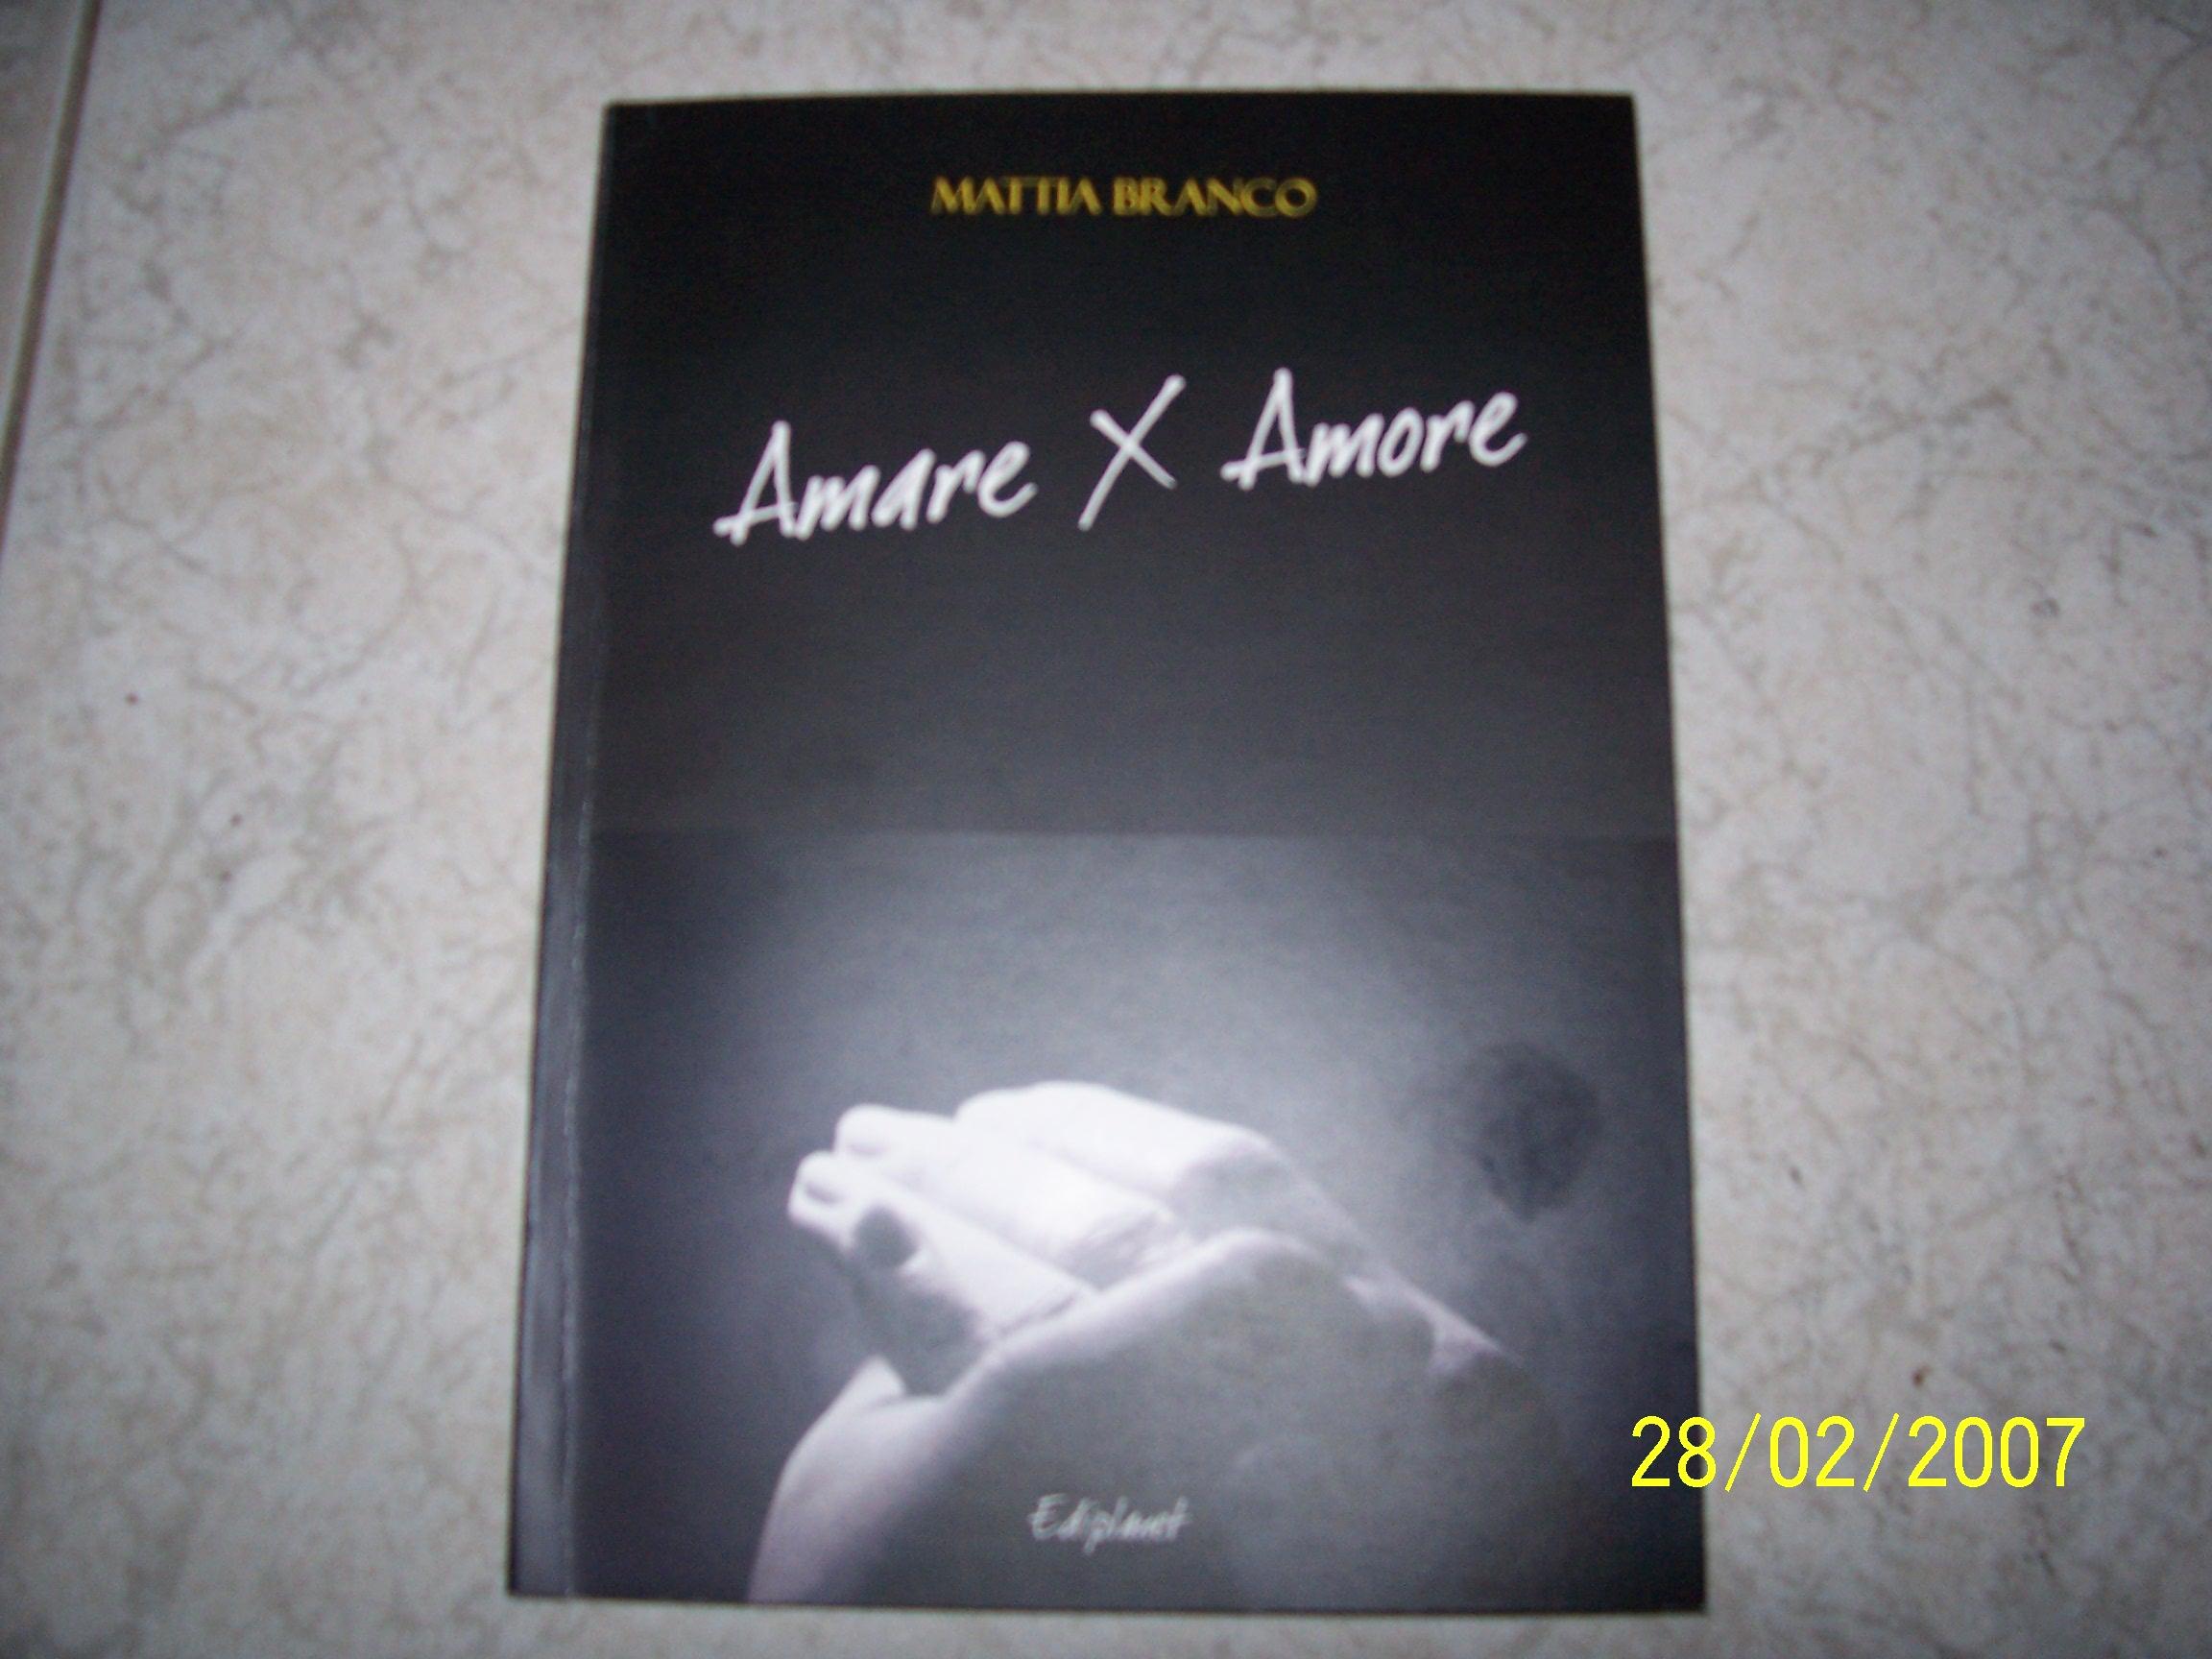 Amare x Amore